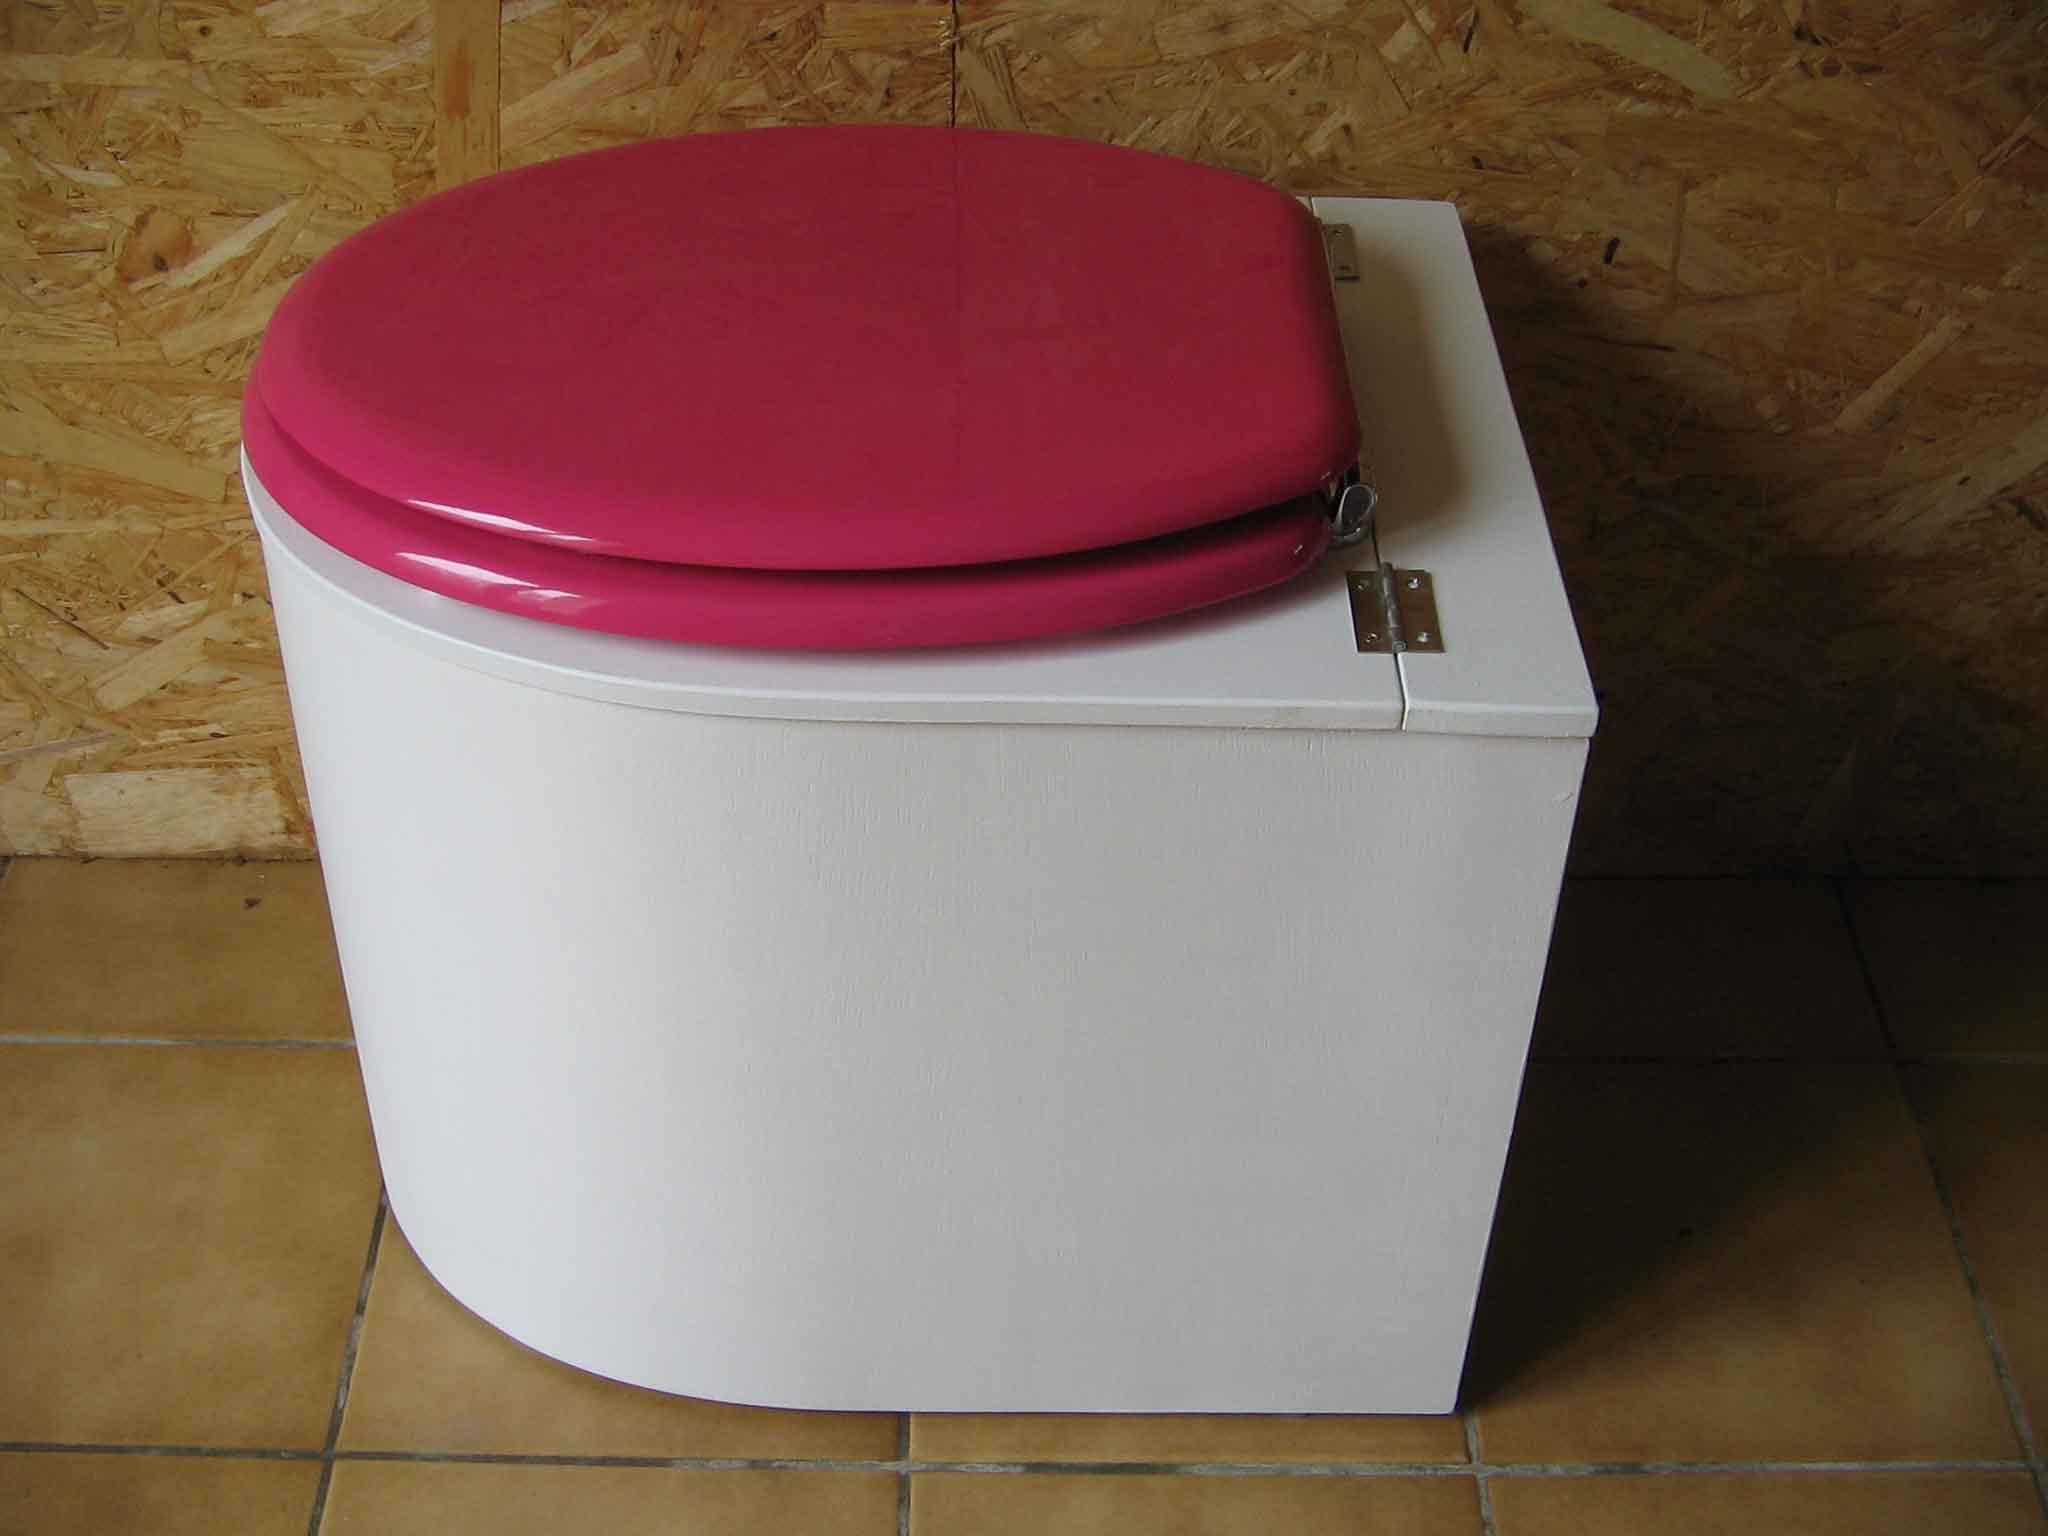 Toilette seche moderne blanche et rose